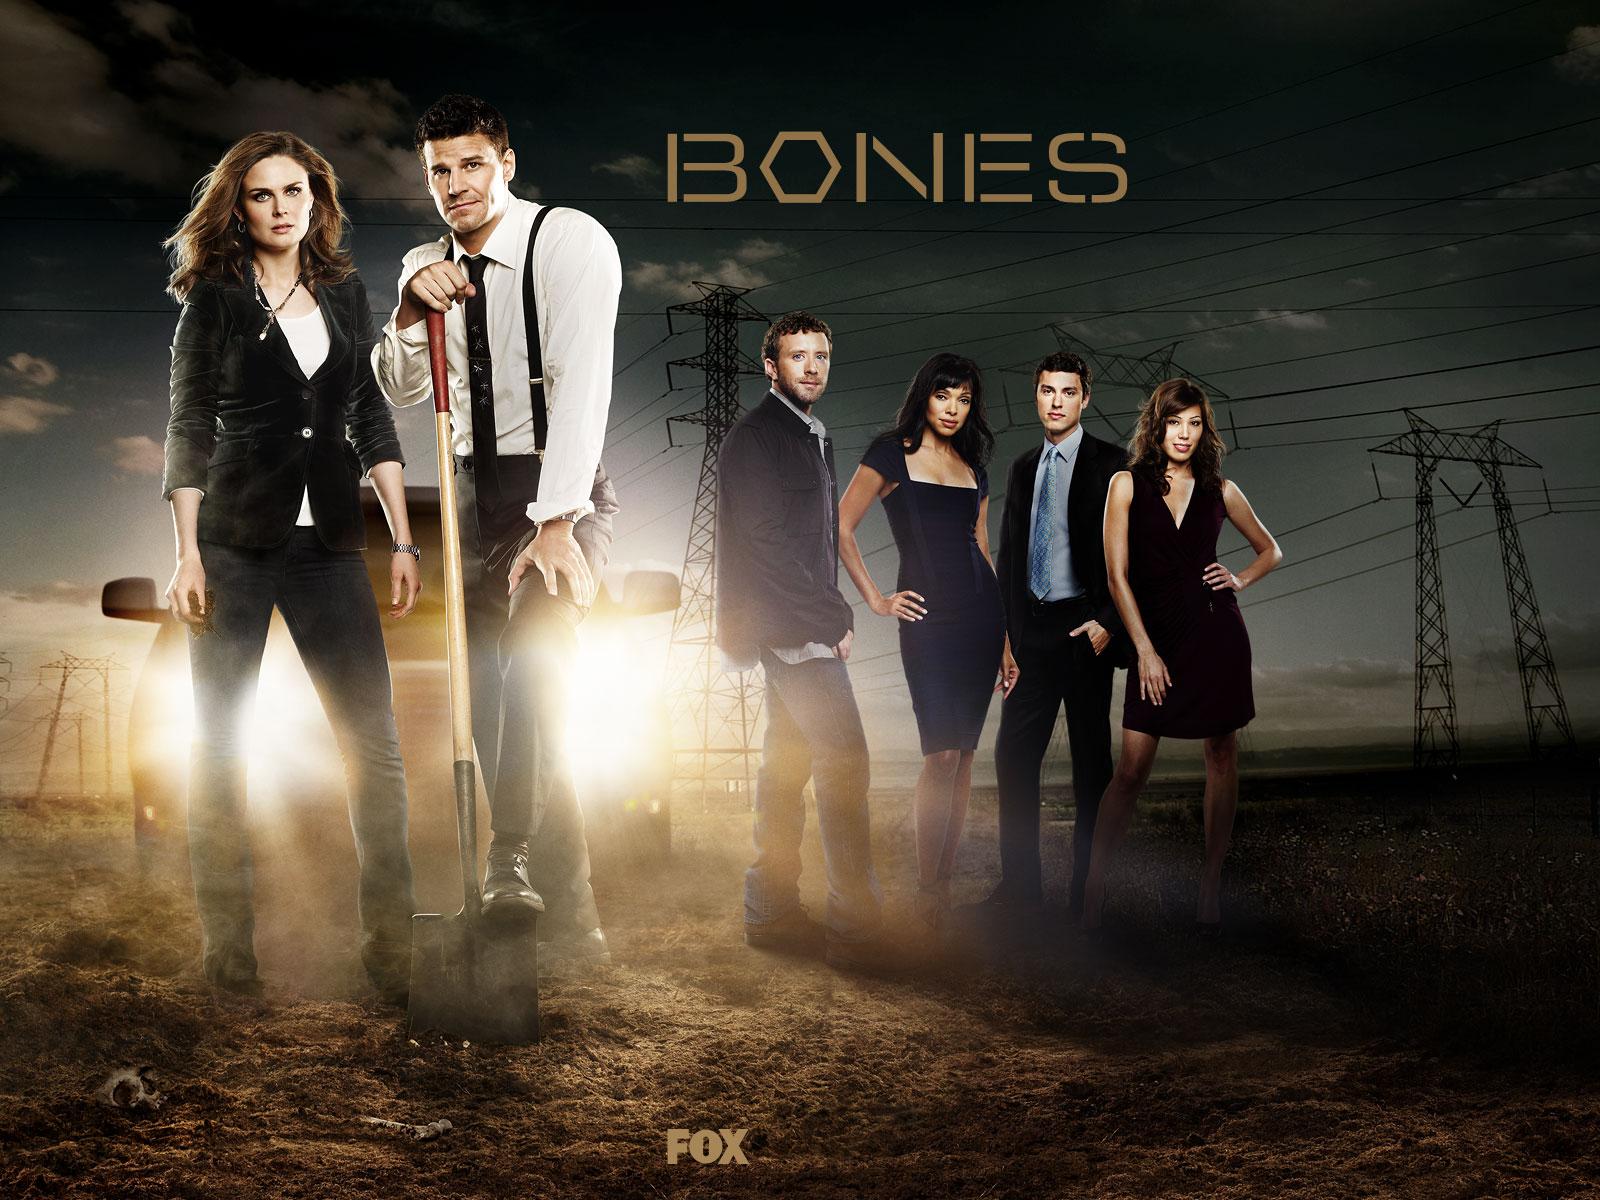 http://1.bp.blogspot.com/_2U3U6AwE-ZQ/TJiEV8Az0mI/AAAAAAAAAYg/xGmztzTmYsg/s1600/bones-001(www.TheWallpapers.org).jpg